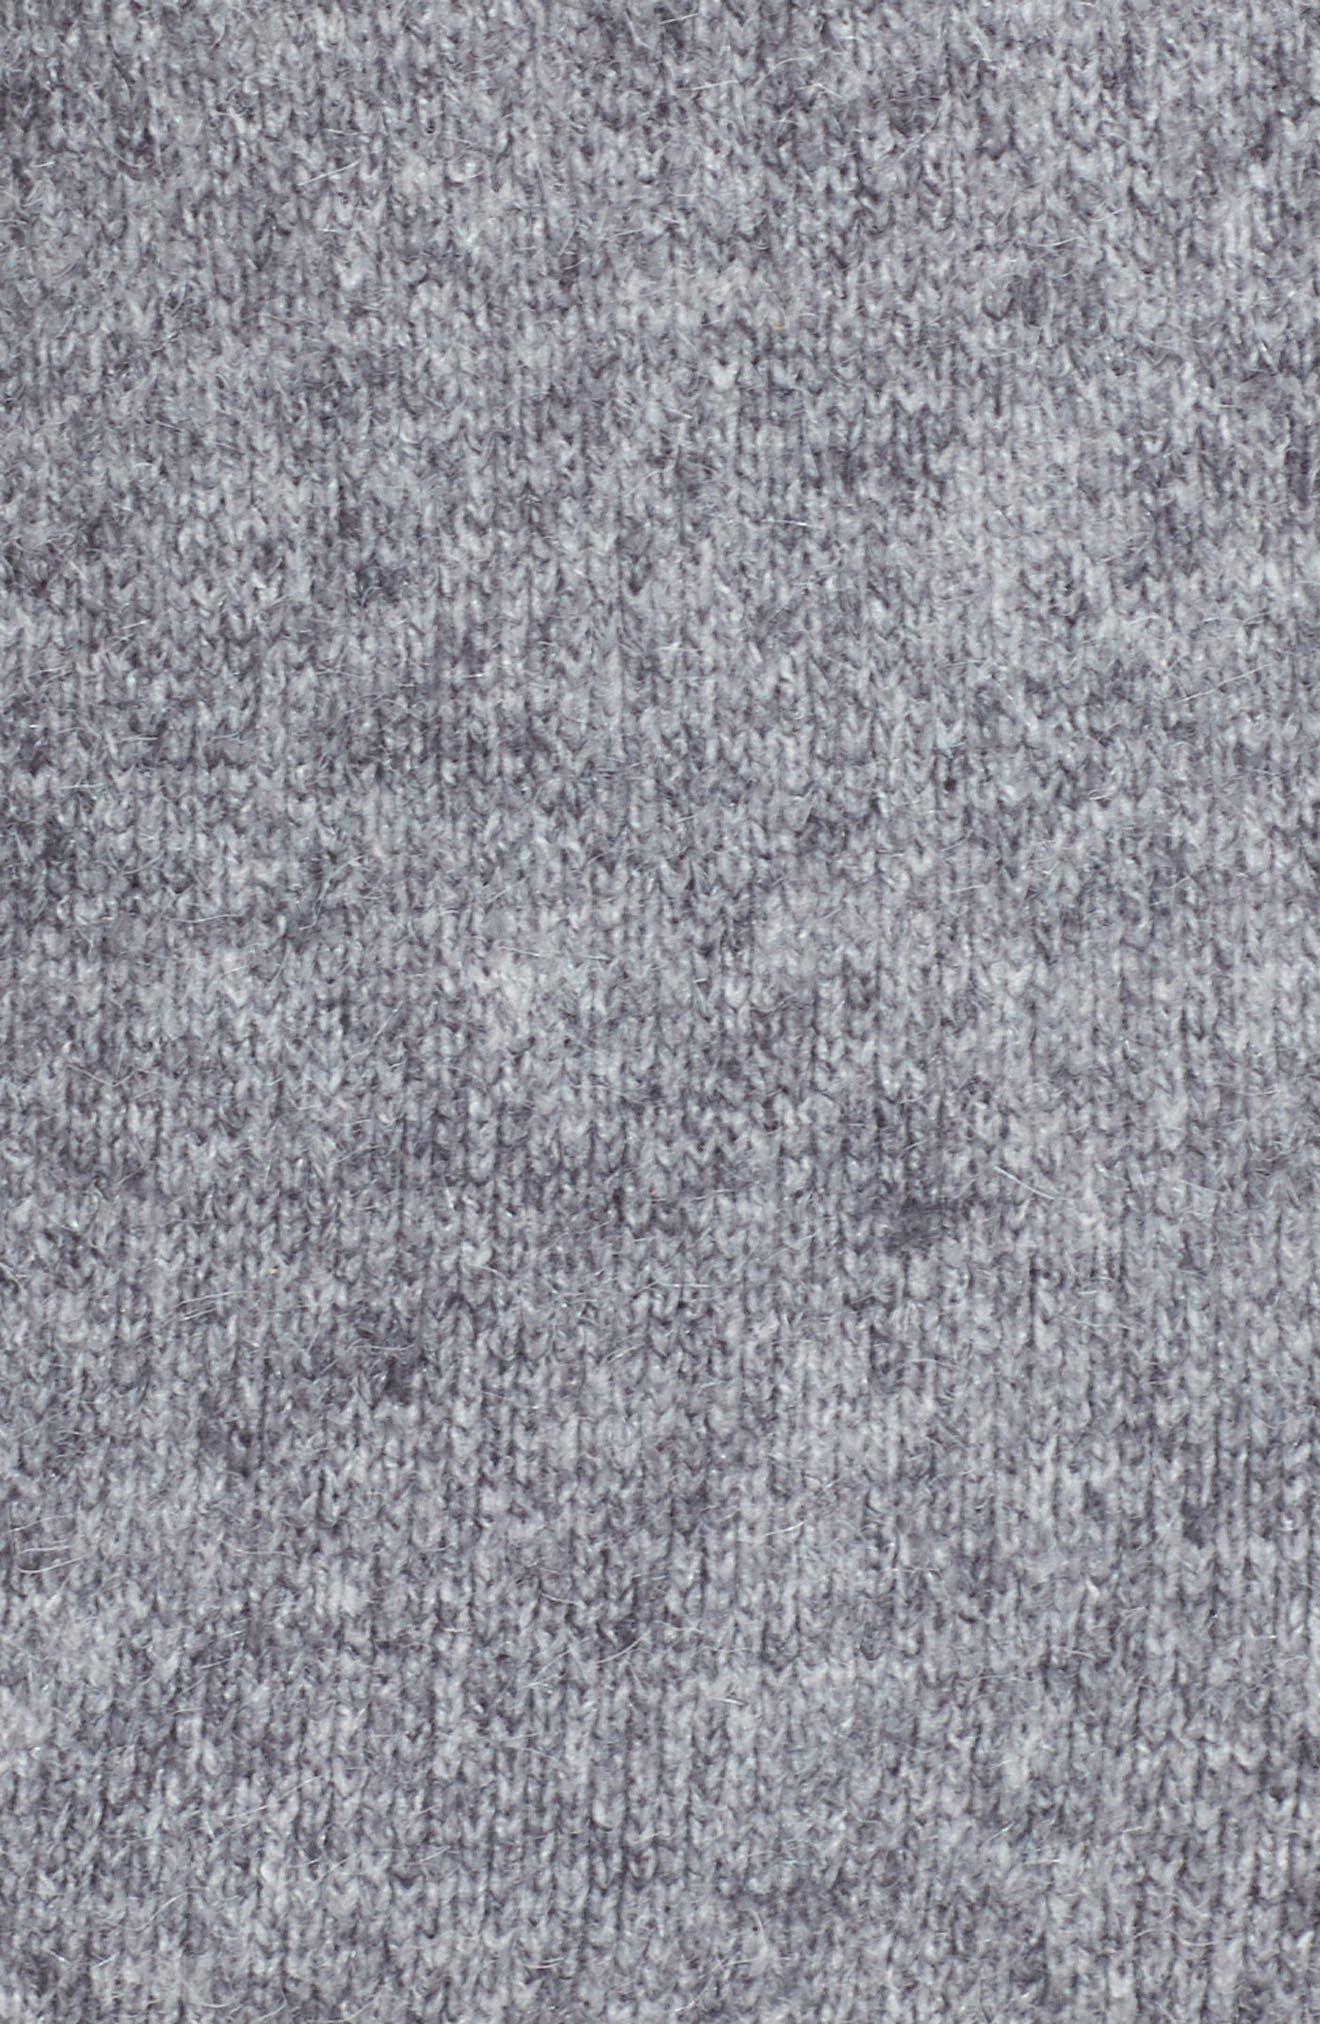 Zanja Embroidered Knit Bomber Jacket,                             Alternate thumbnail 6, color,